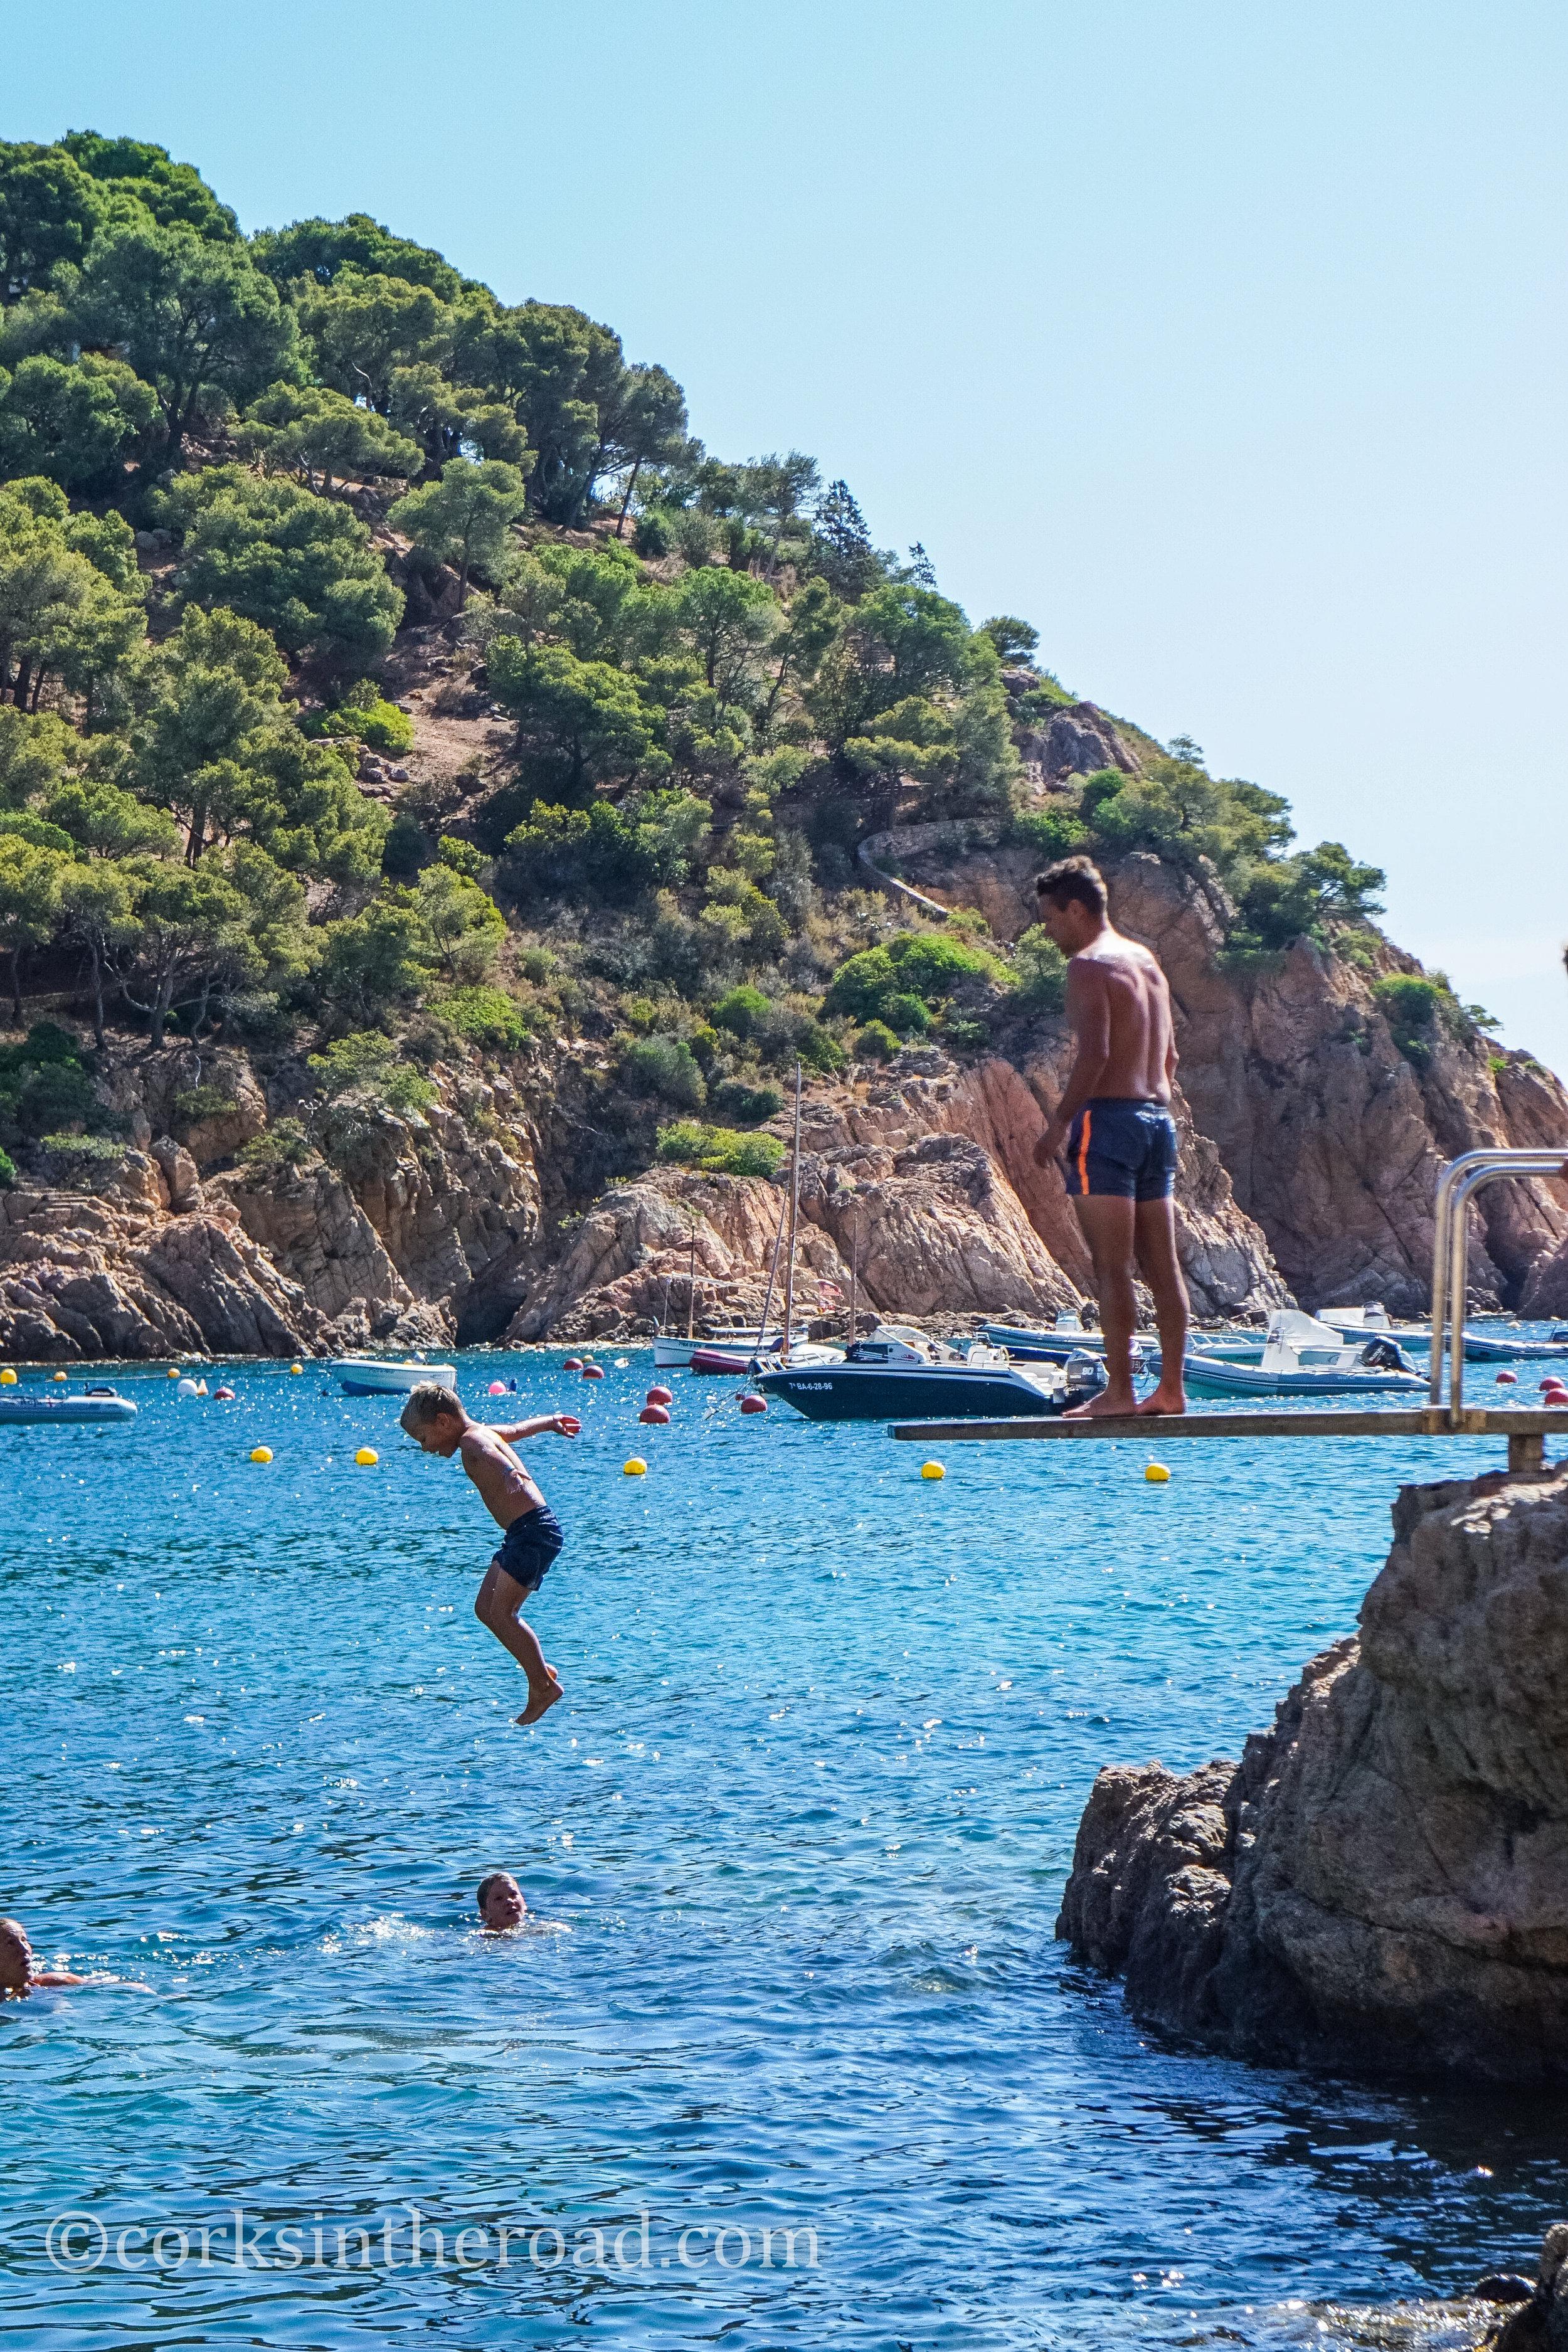 20160810Barcelona, Corksintheroad, Costa Brava, Costa Brava Landscape-13.jpg